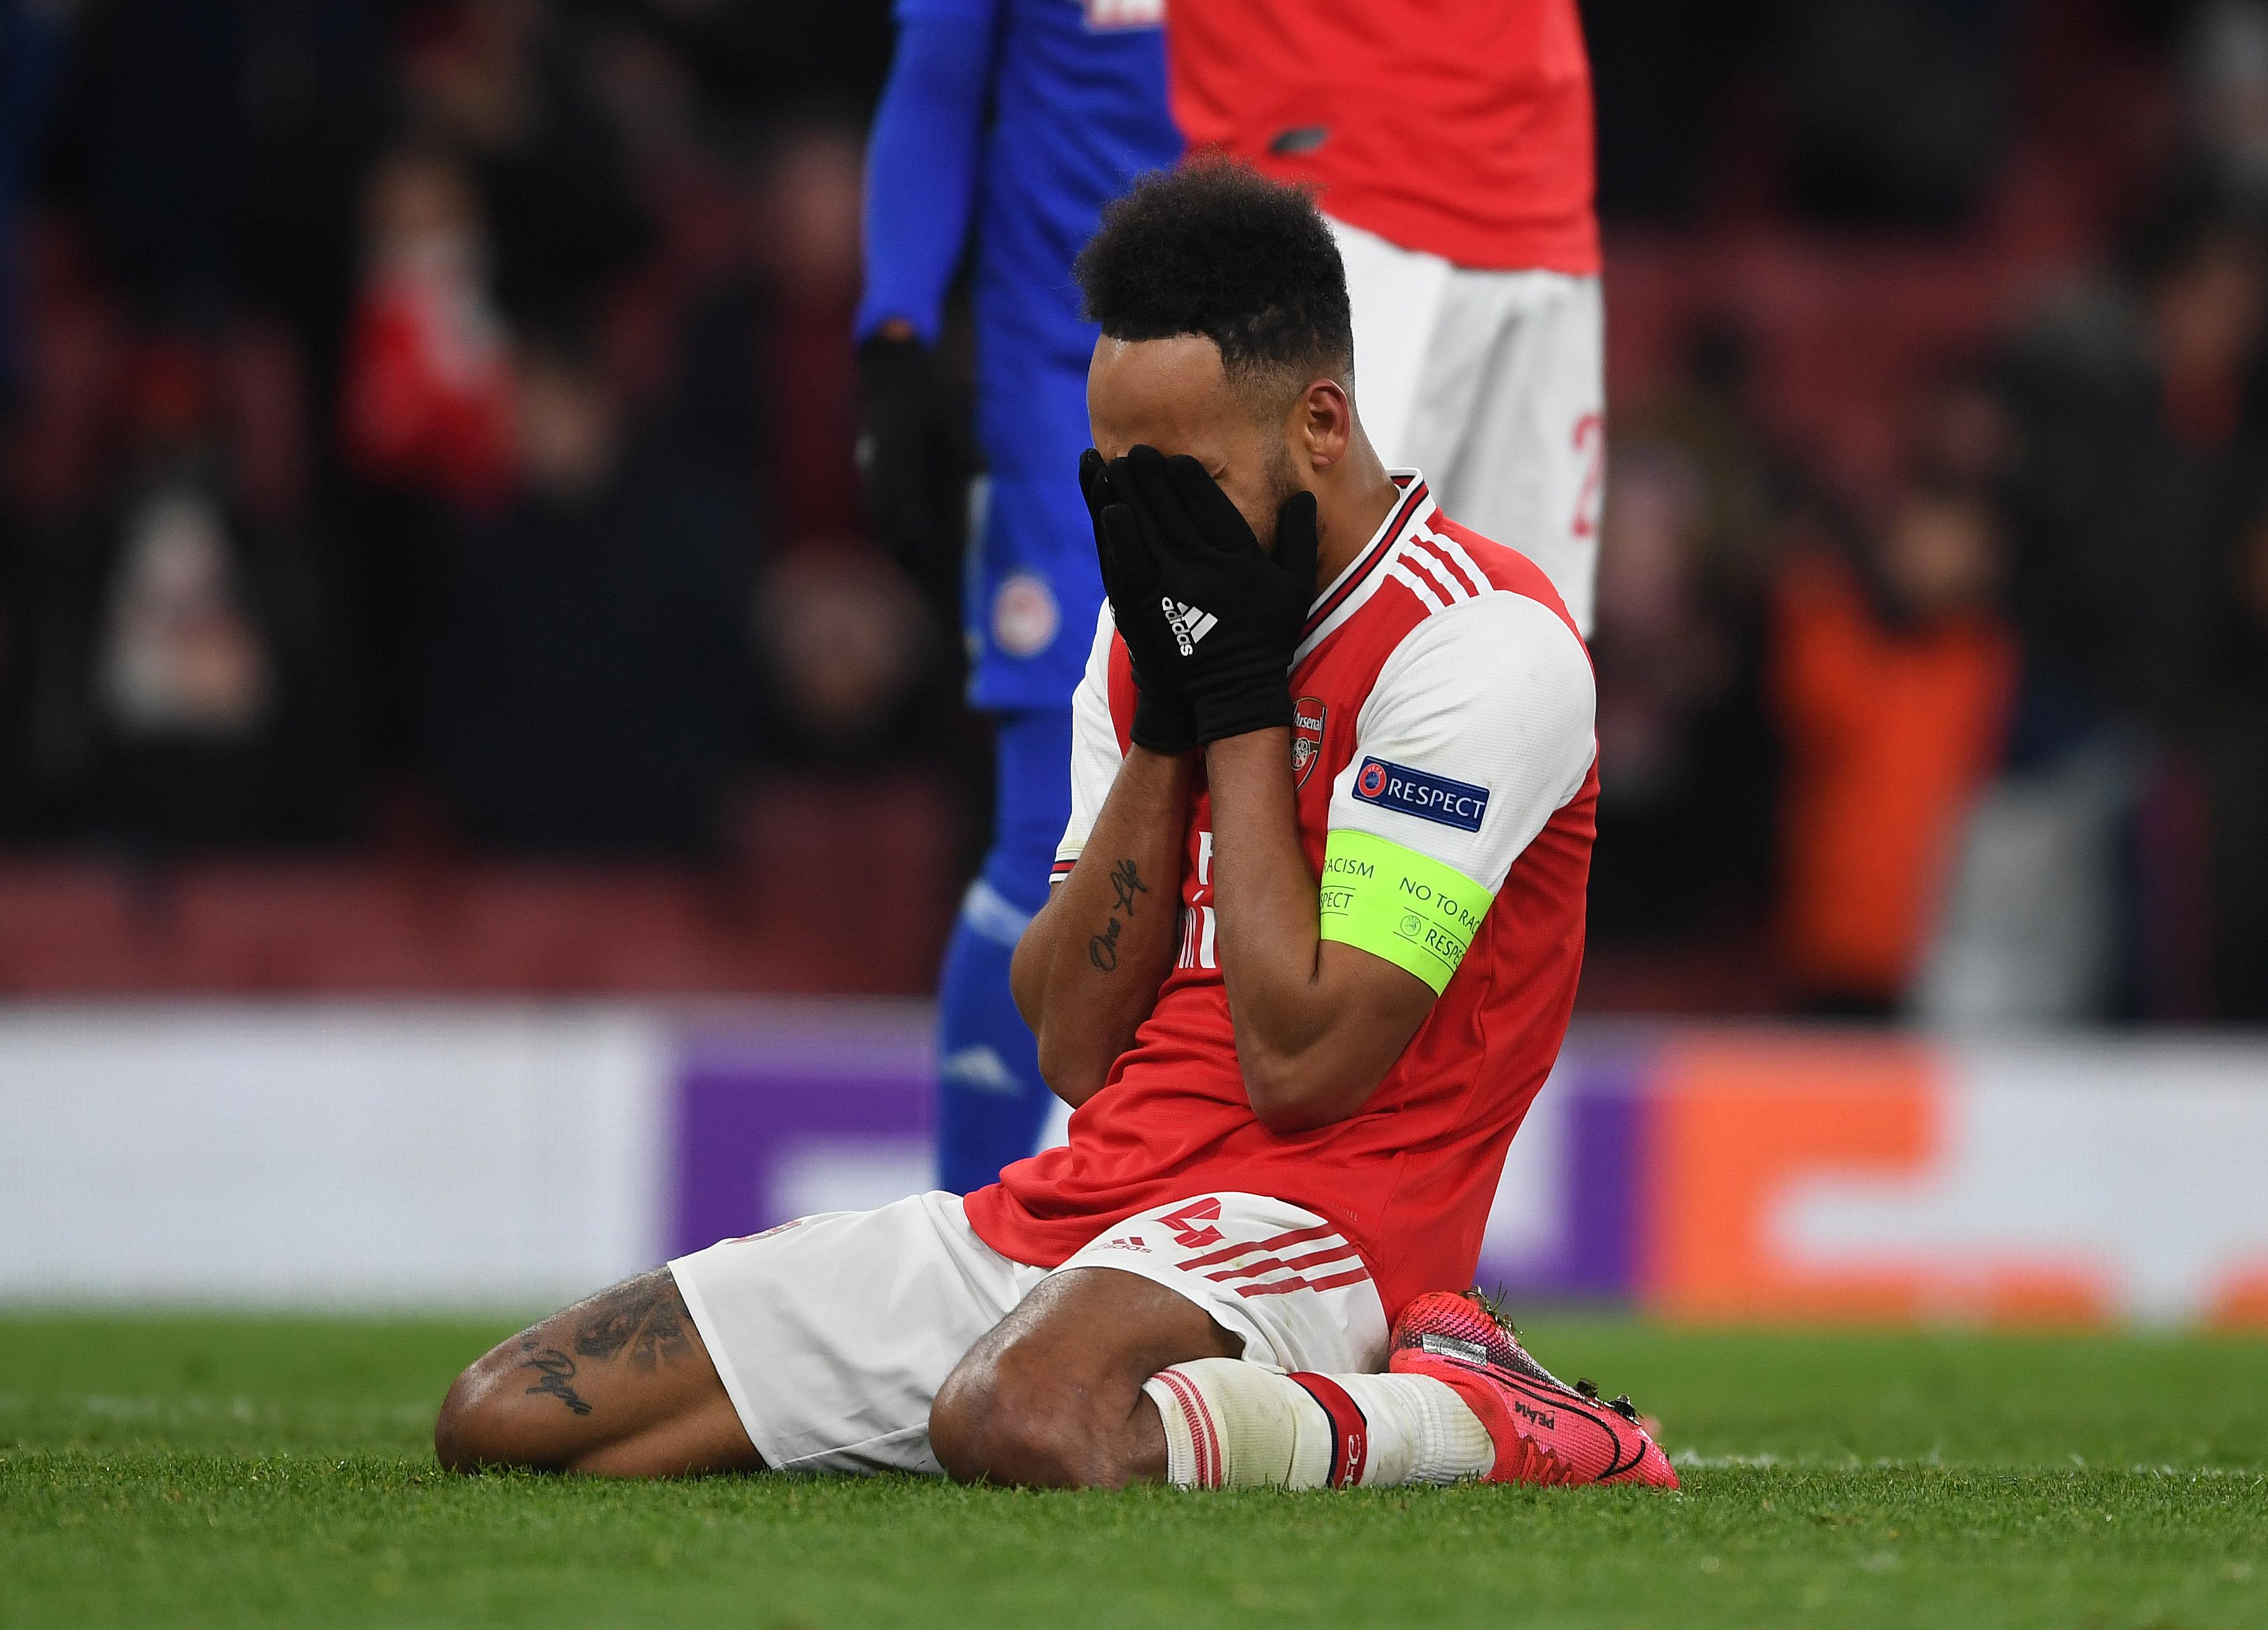 Pierre-Emerick Aubameyang - Arsenal FC - Premier League